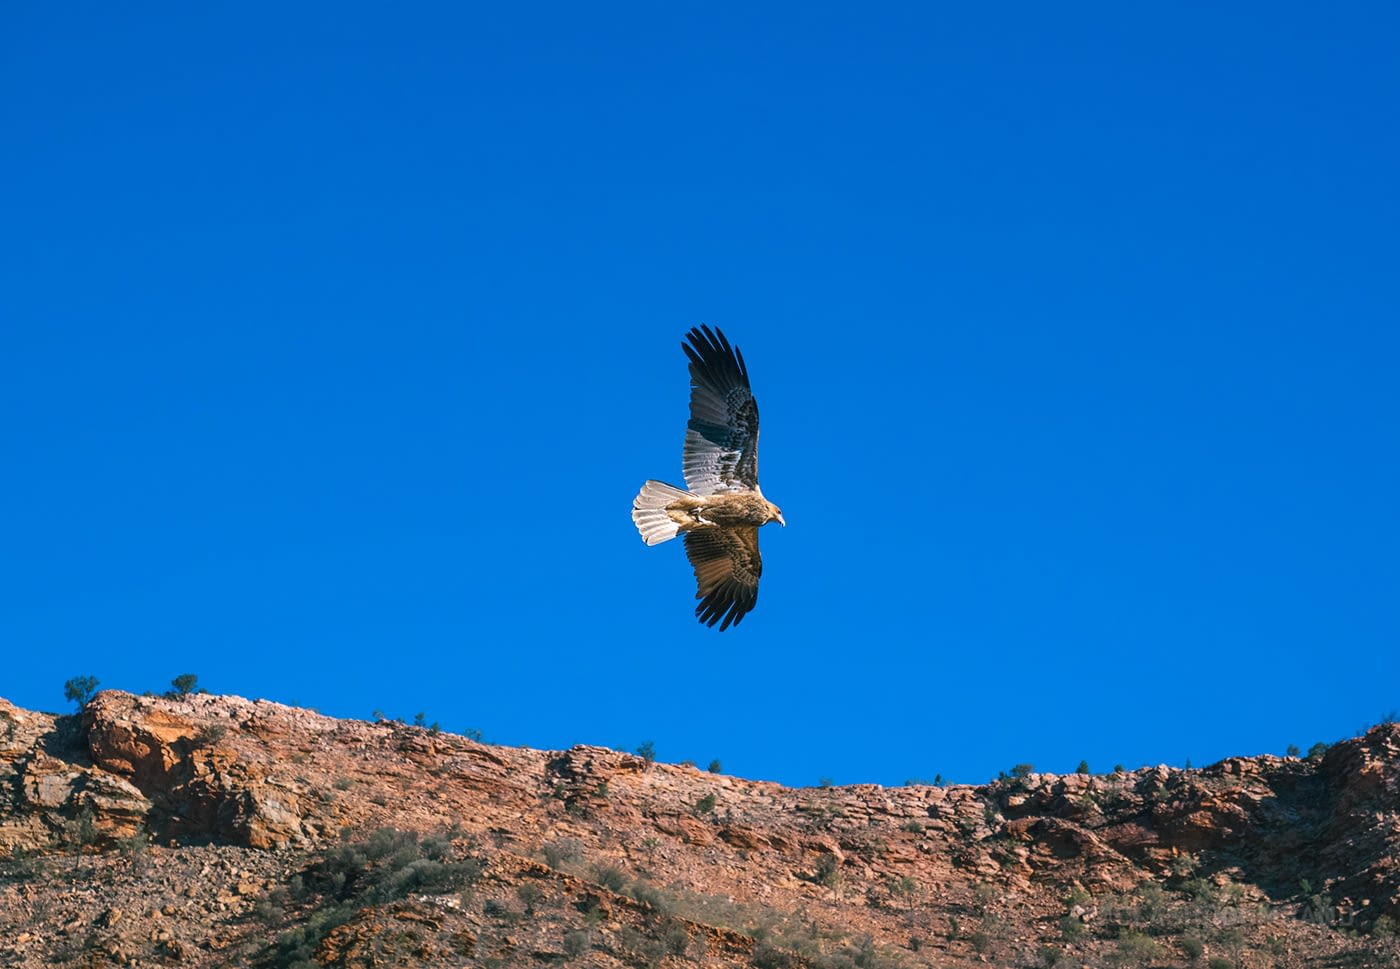 NT Australia - Eagle soaring in the sky